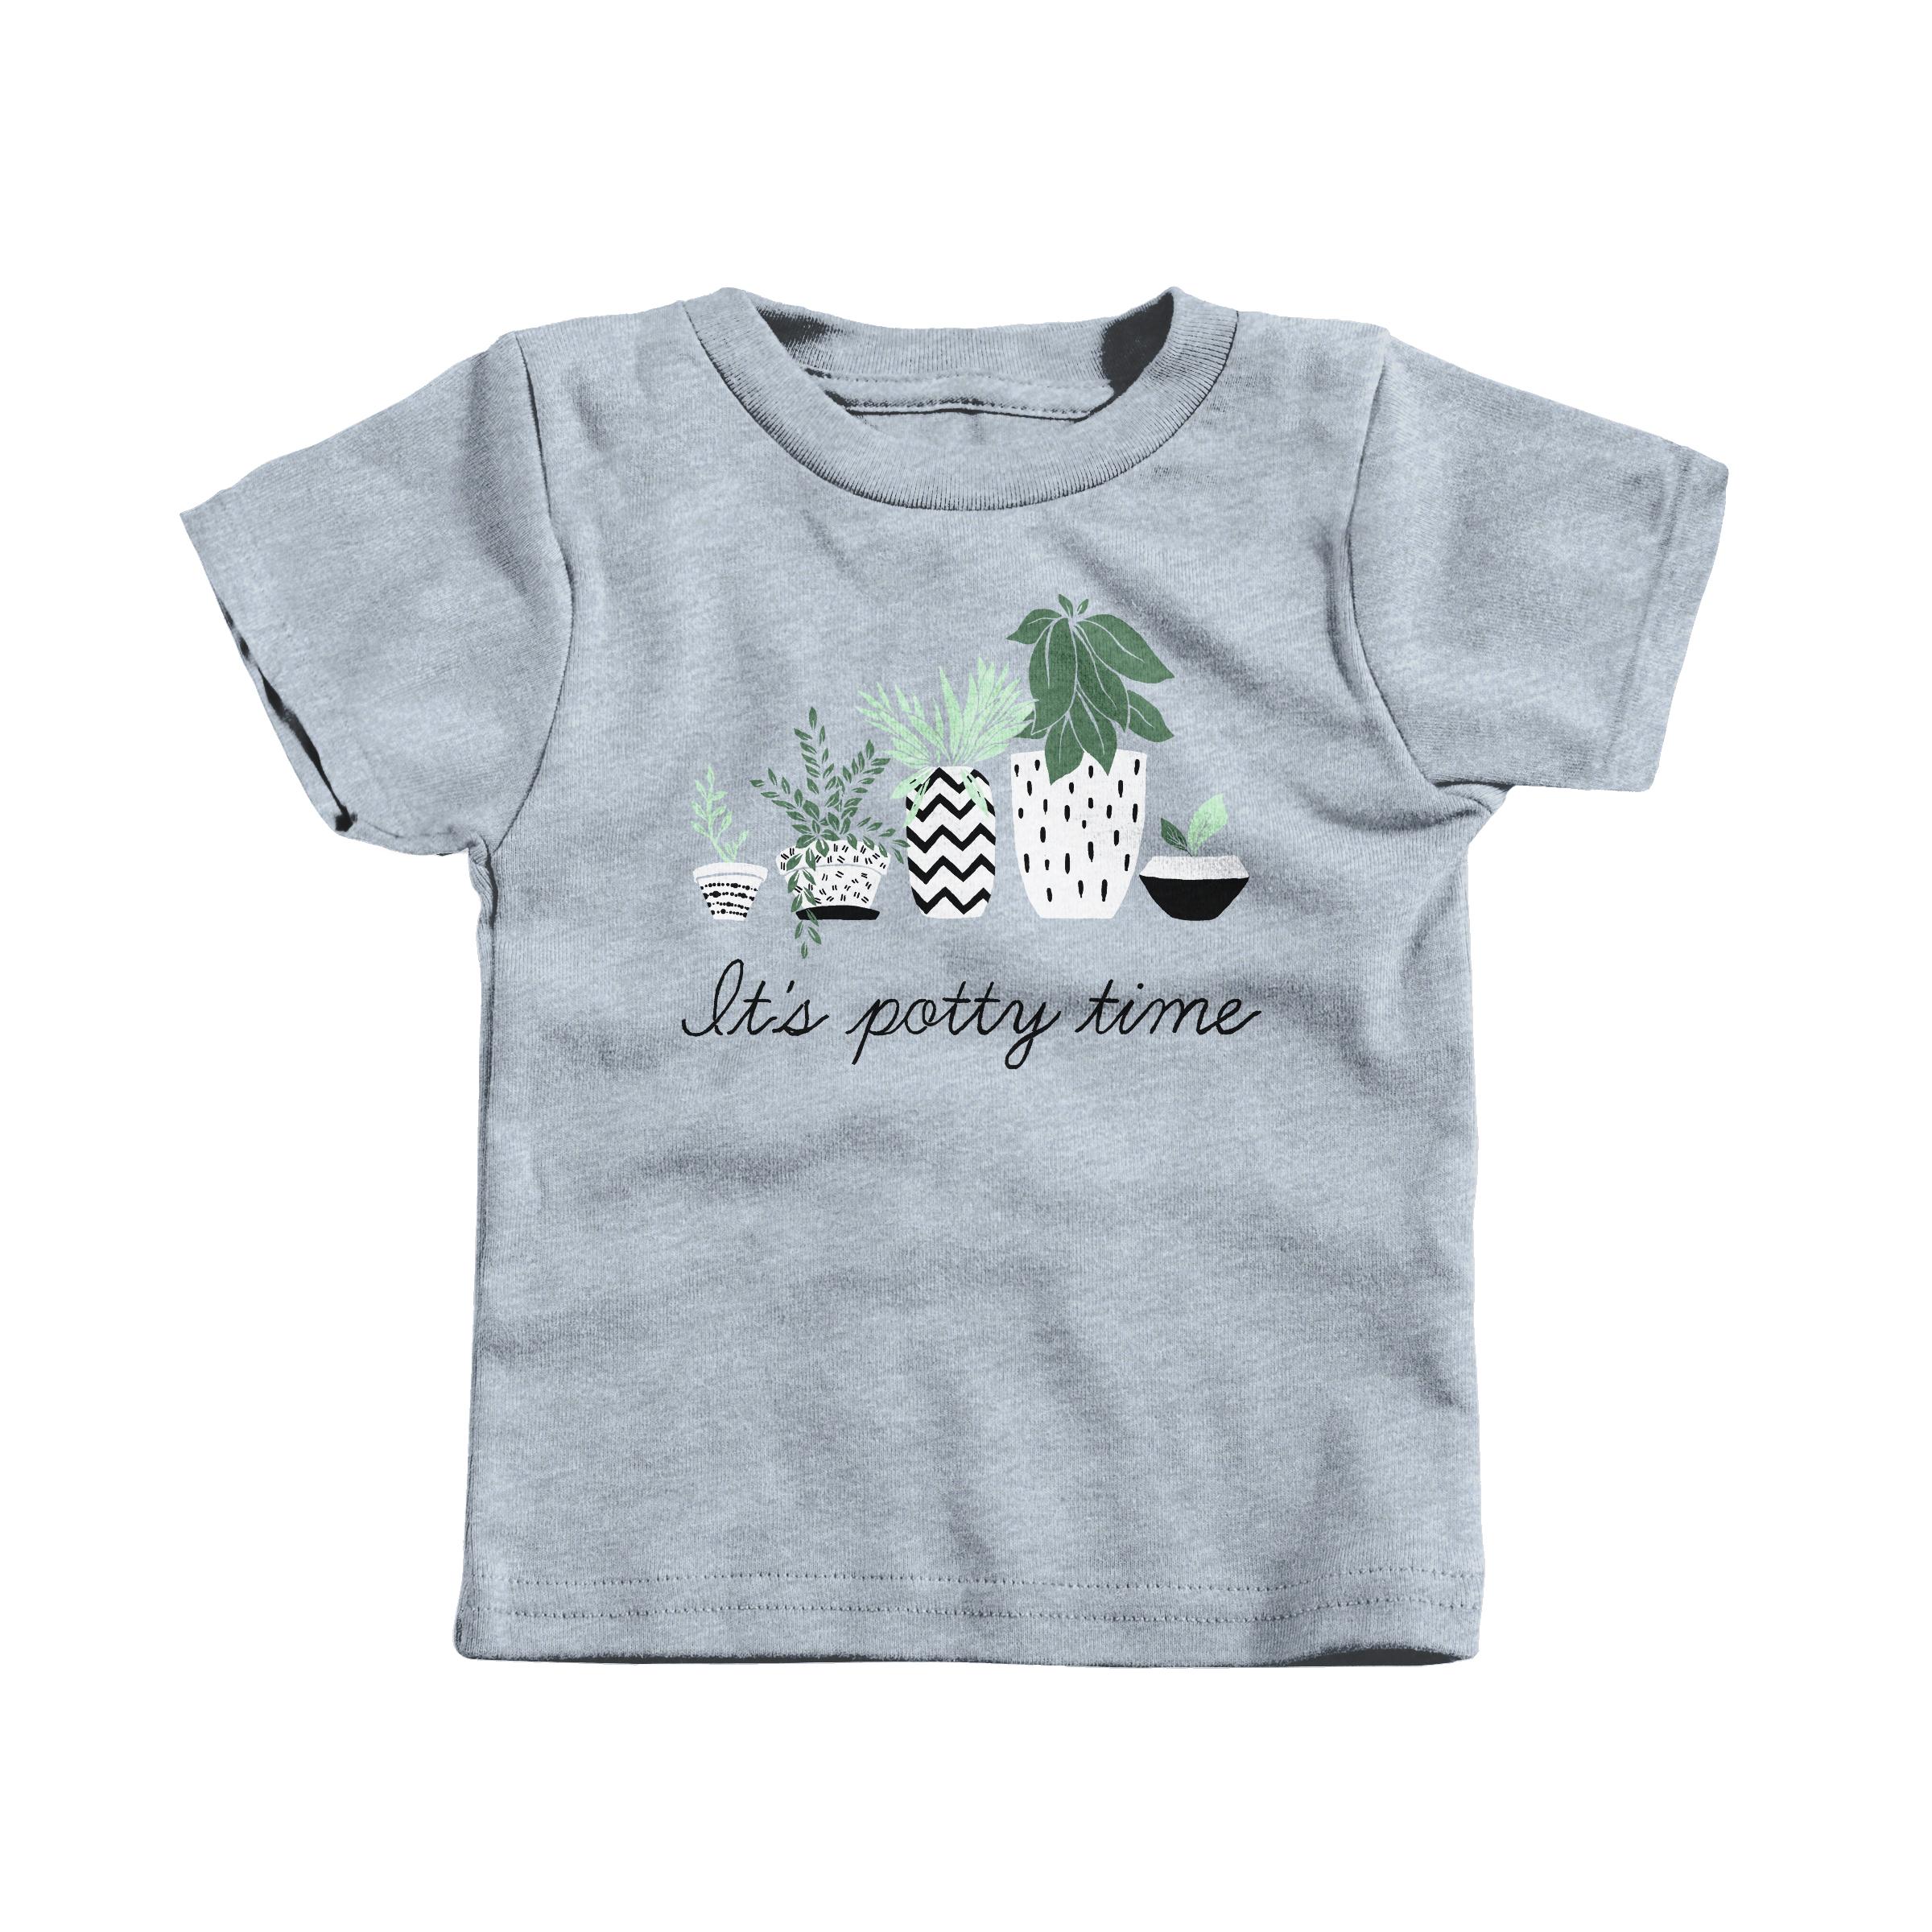 Potty Time Heather Grey (T-Shirt)